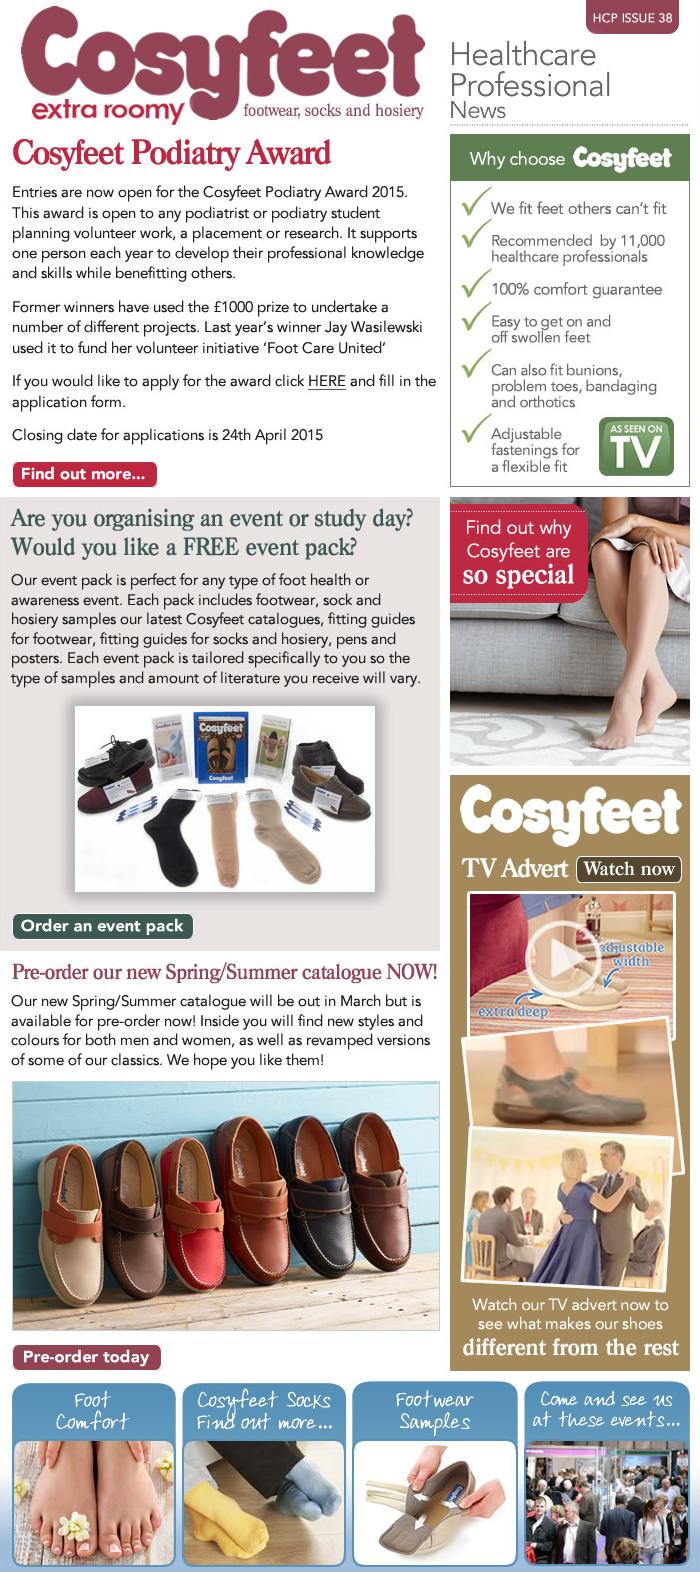 HCP Newsletter - Issue 38